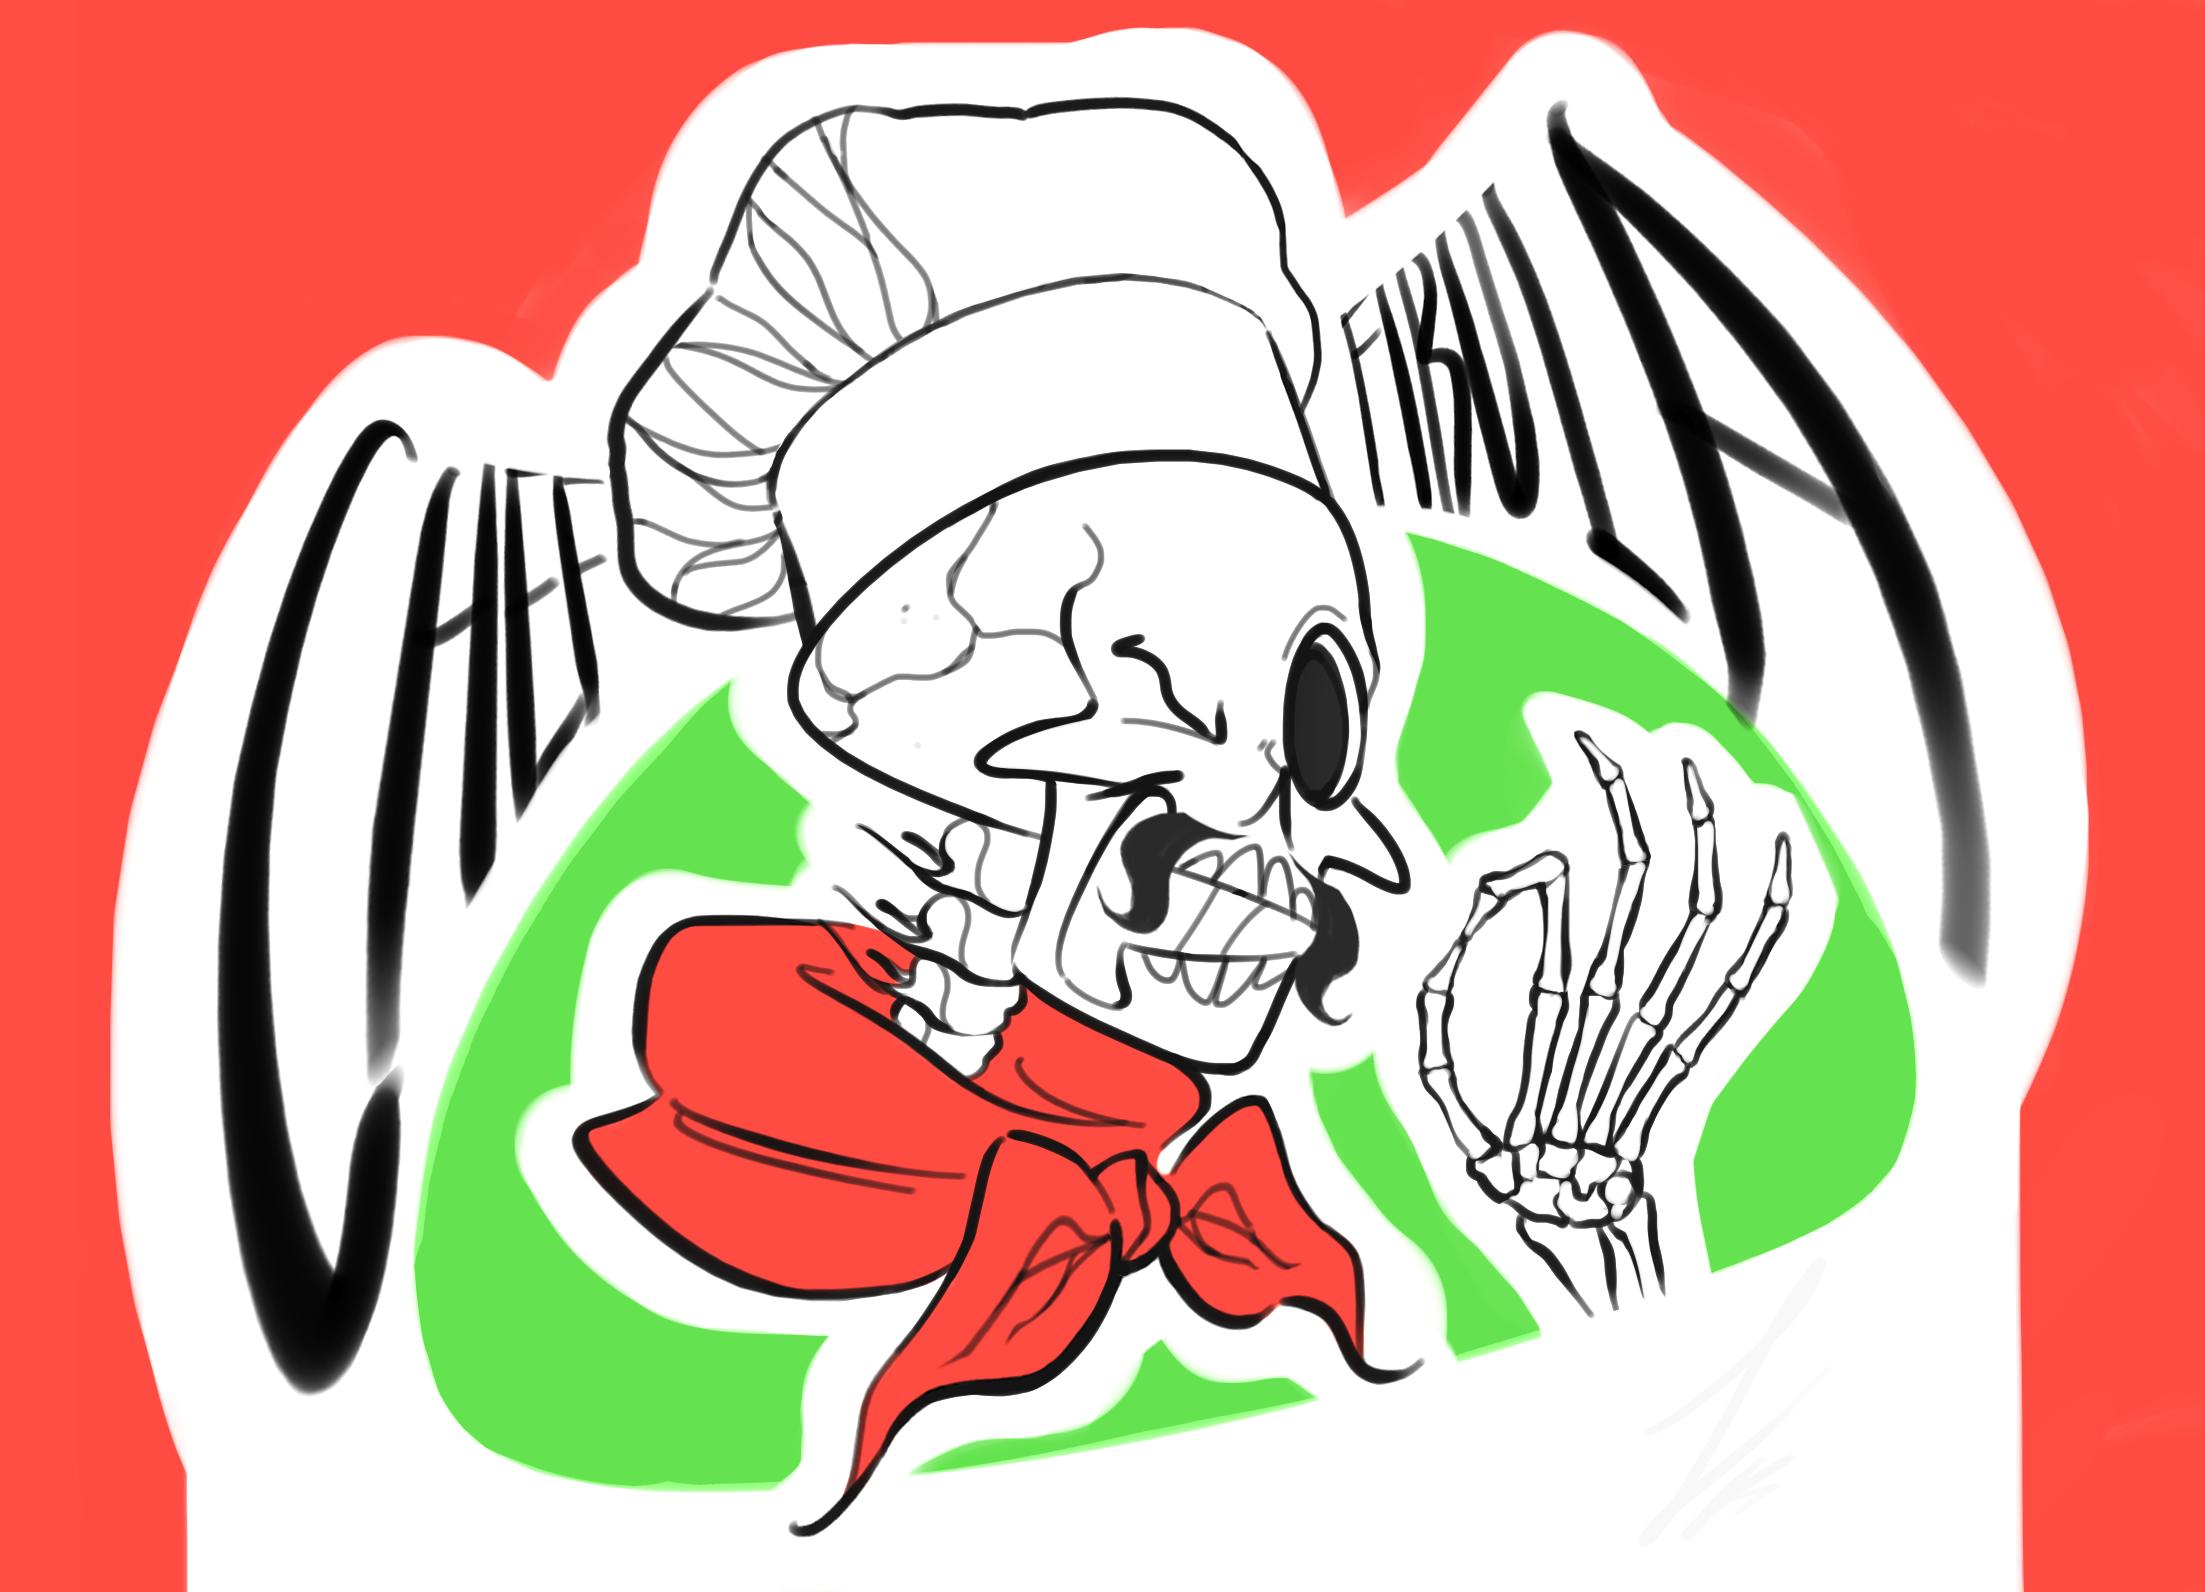 Art Trade - Chef Fibula